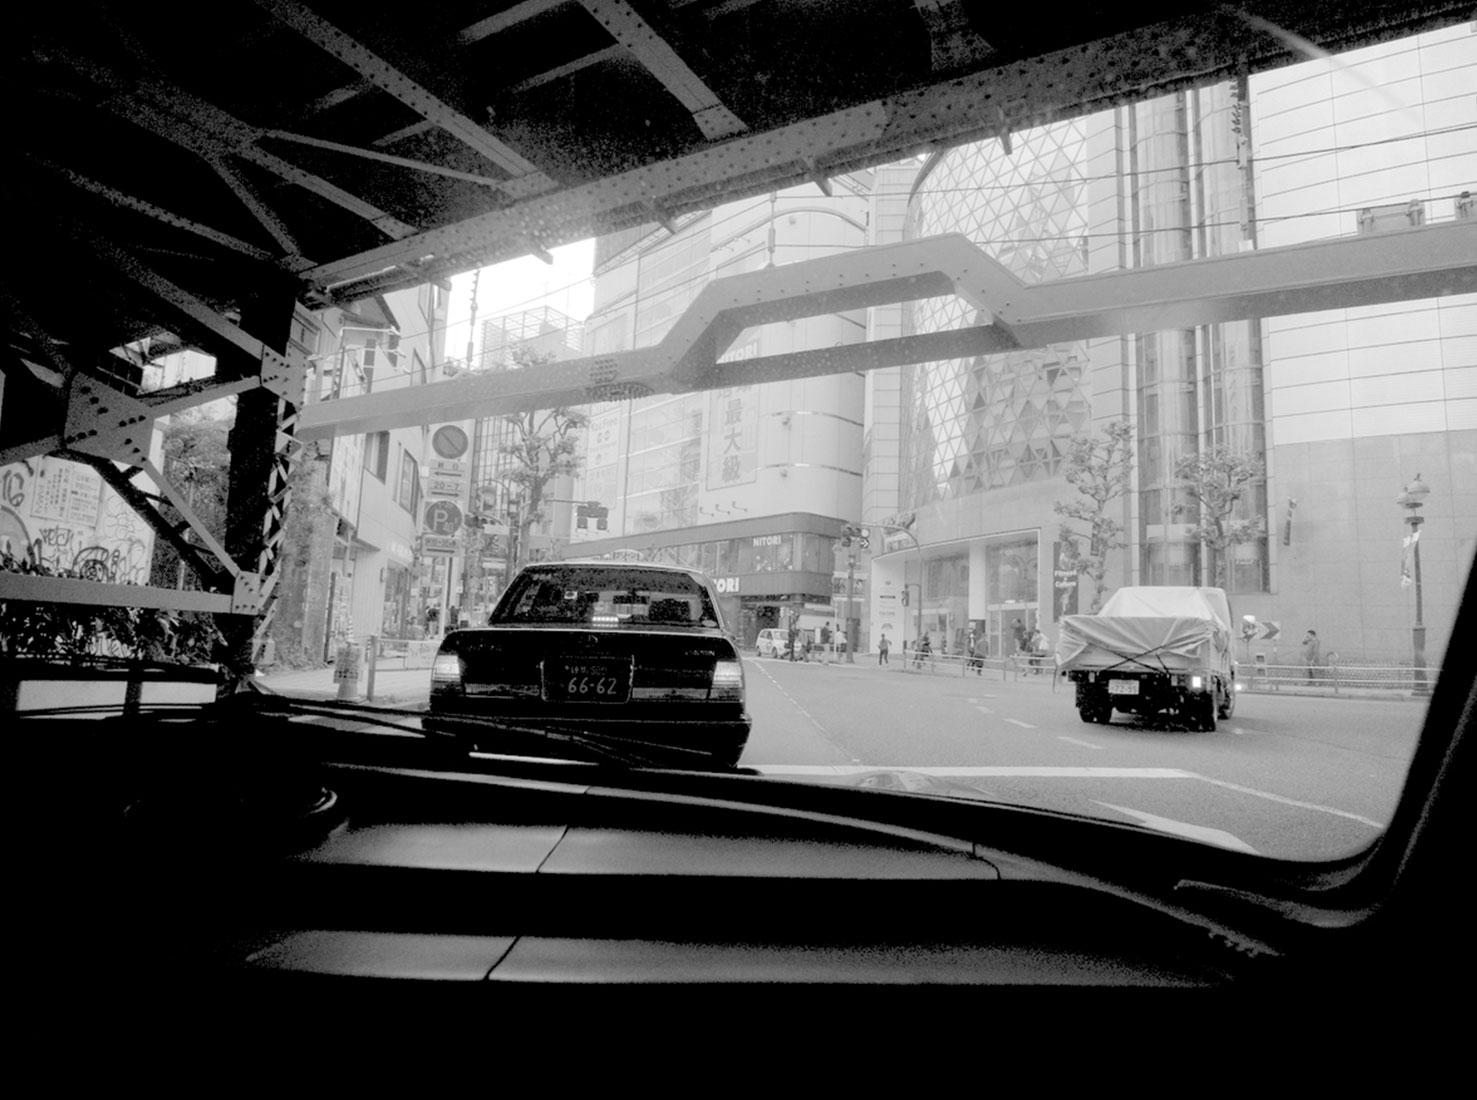 Tokyo Ride кадры фото